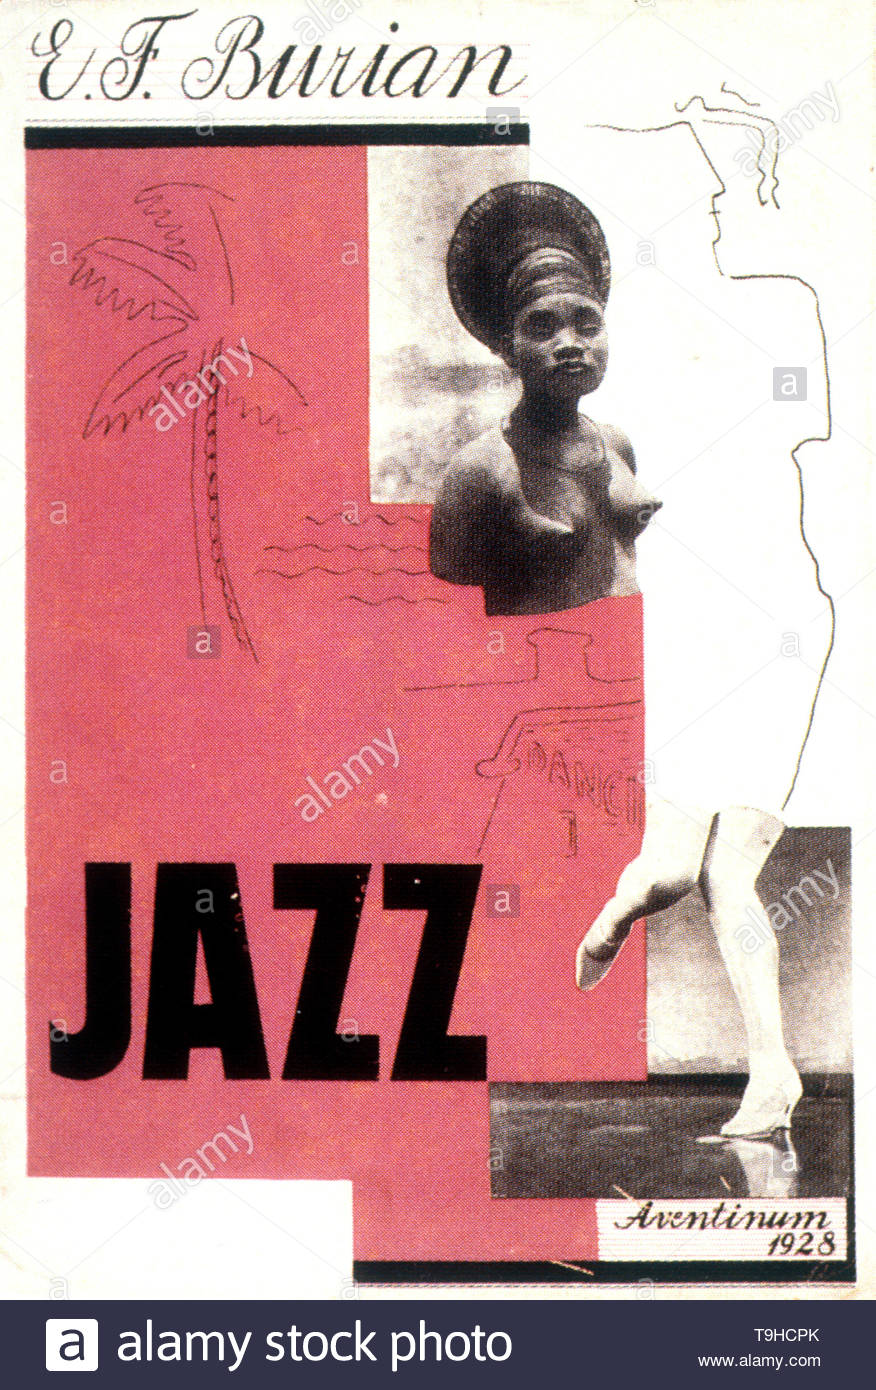 Burian, Emil Frantisek-Book cover design by Karel Šourek for Jazz by Emil František Burian. Praha, Aventinum, 1928. - Stock Image